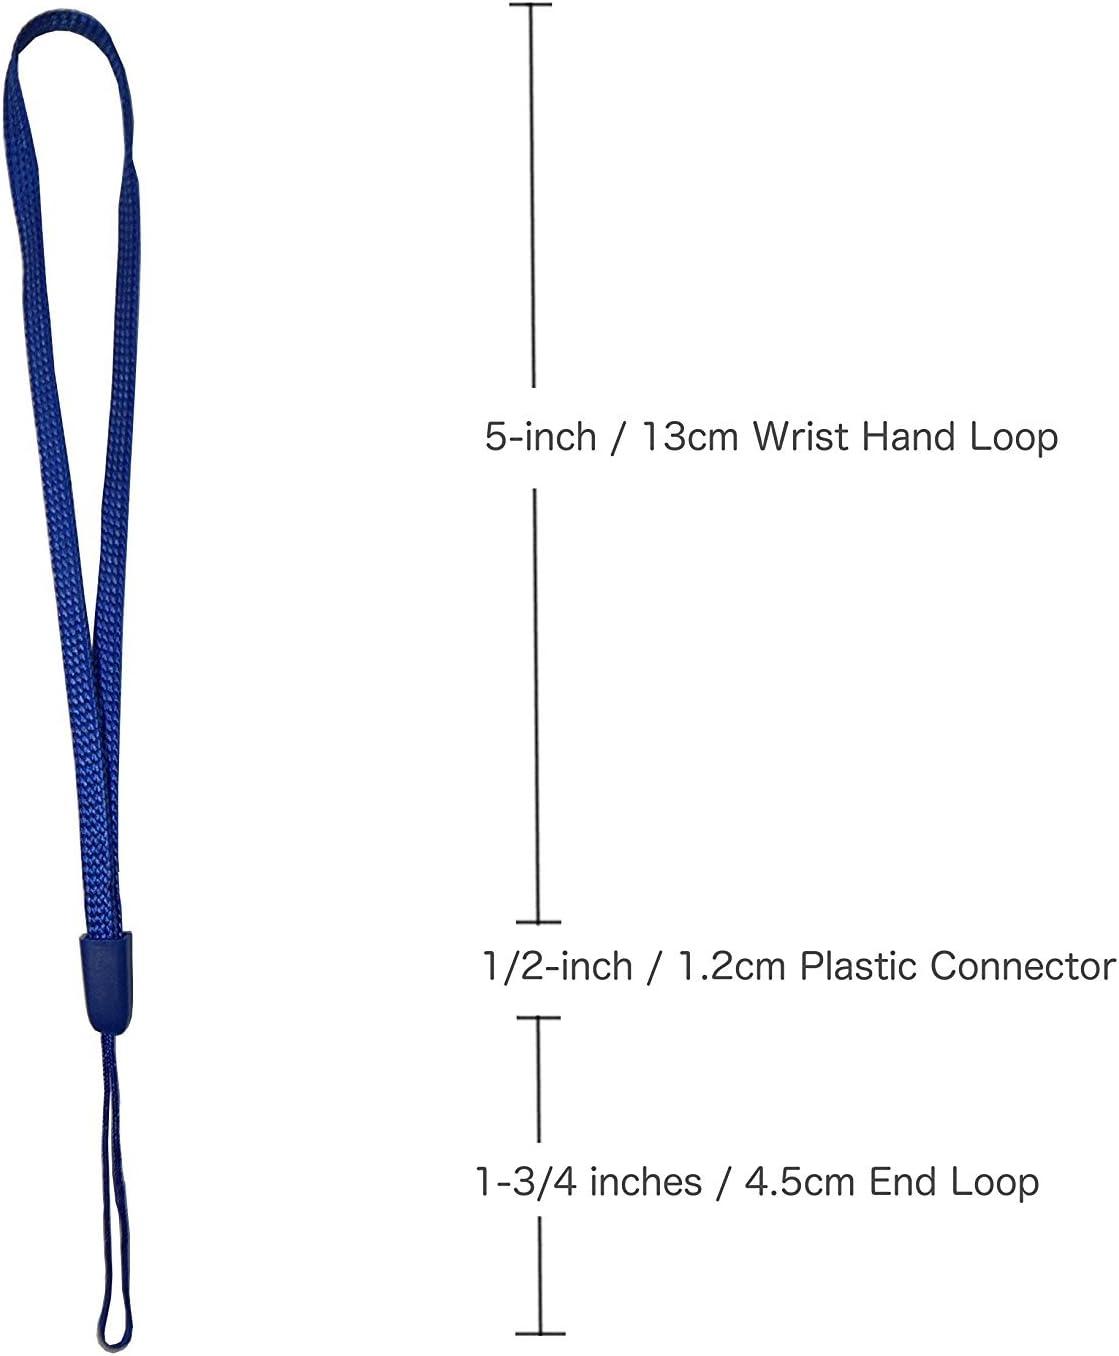 Yaxiny Hand Wrist Strap Lanyard for Cell Phone Mp3 Mp4 USB Flash Drive 50PCS, Green Mini Camera